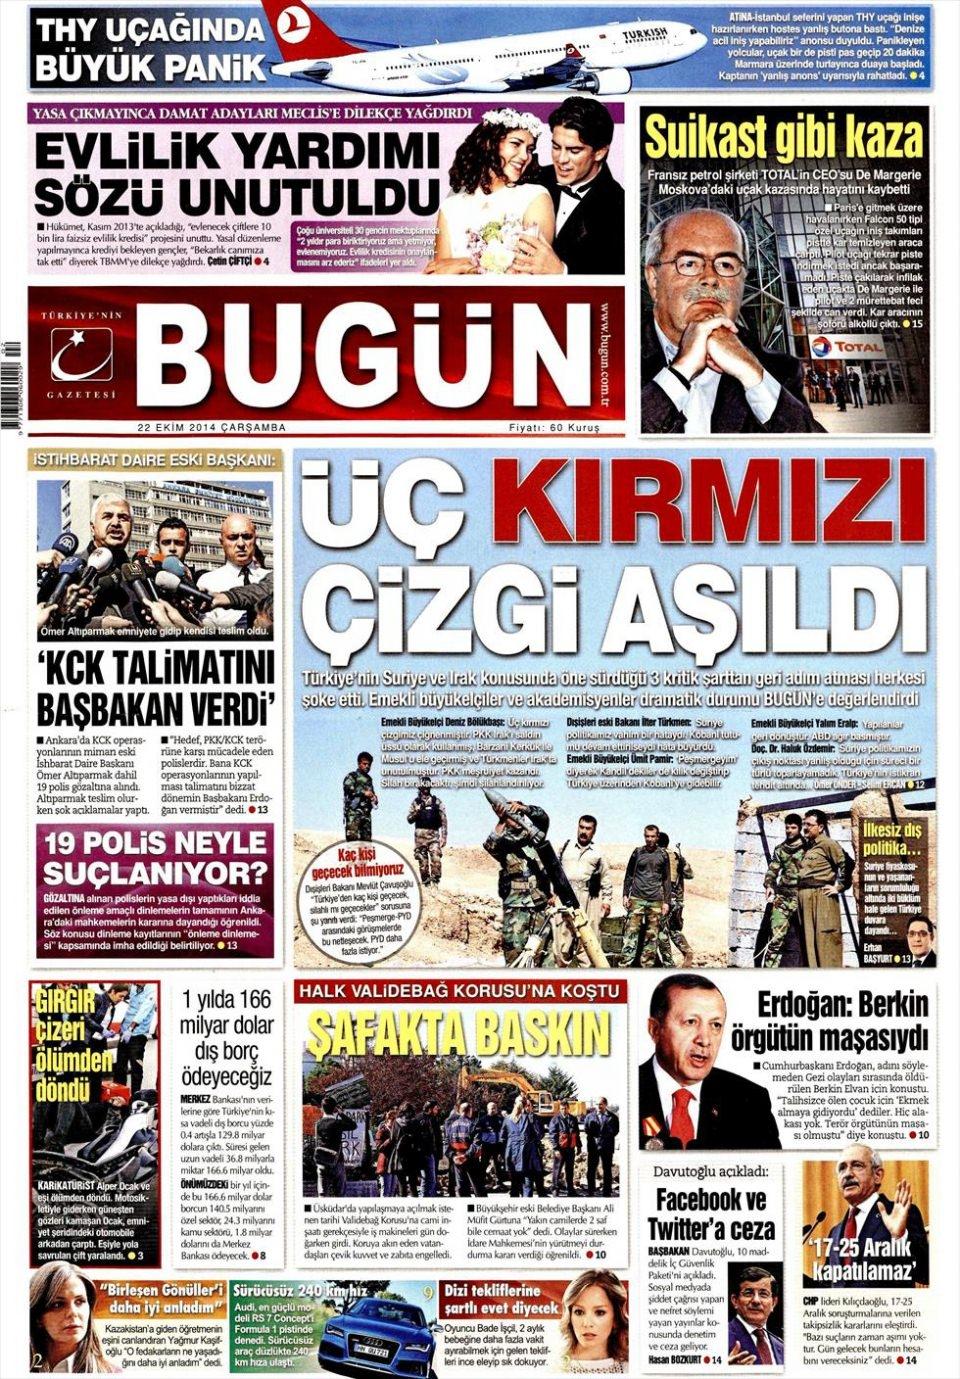 22 Ekim 2014 gazete manşetleri 3